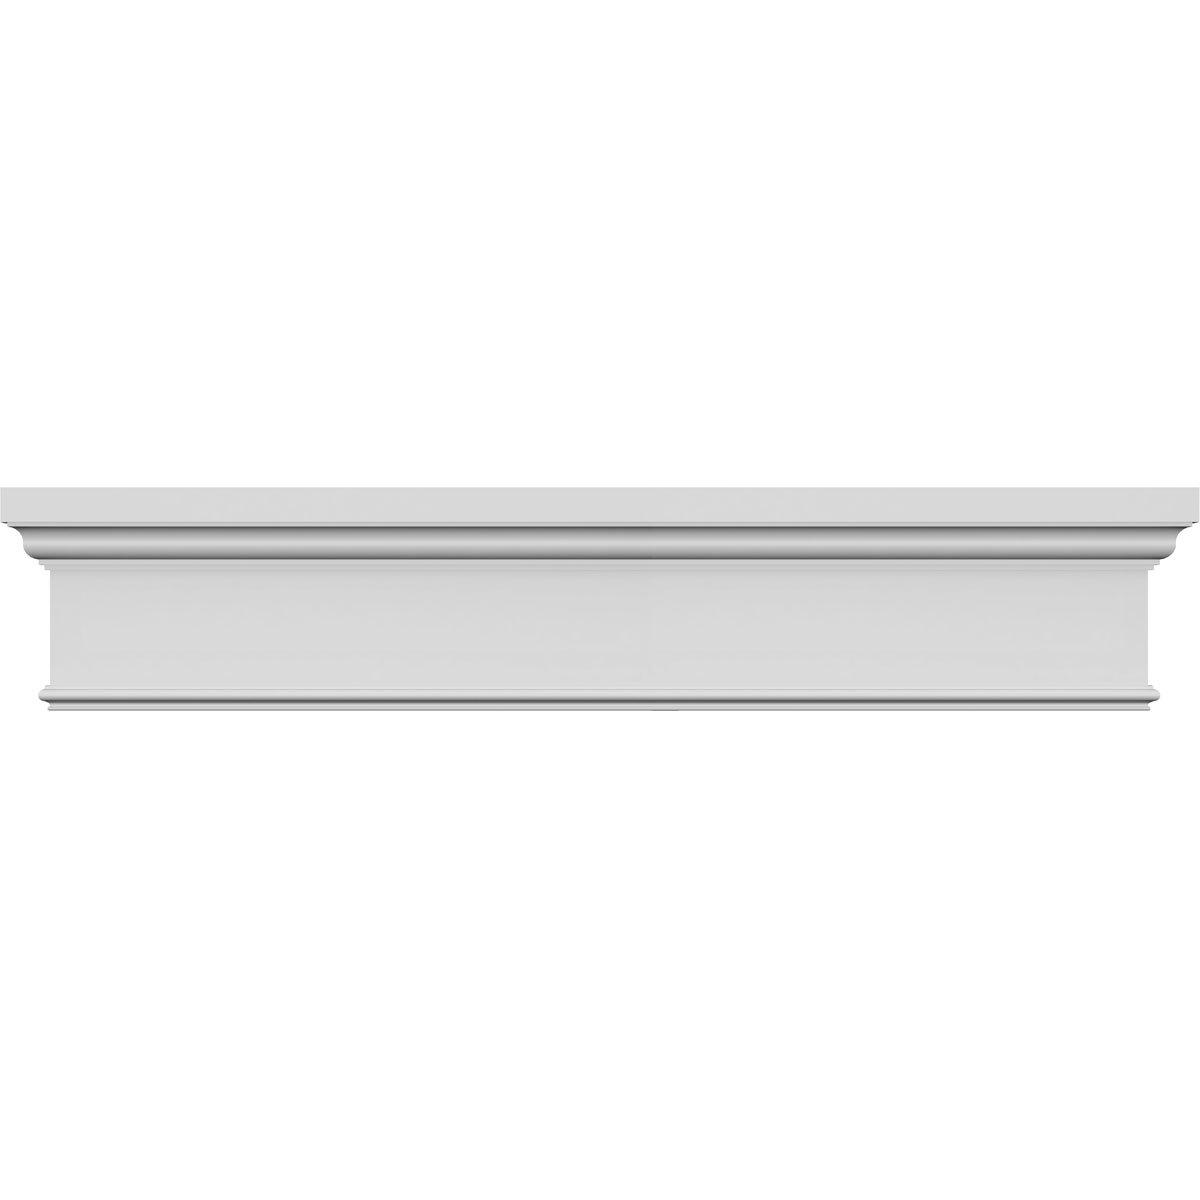 Ekena Millwork CRH14X57ST 57'' Bottom 62 1/4'' Top Width x 13 3/4'' H x 7/8'' P Standard Crosshead, Width Width, Factory Primed White by Ekena Millwork